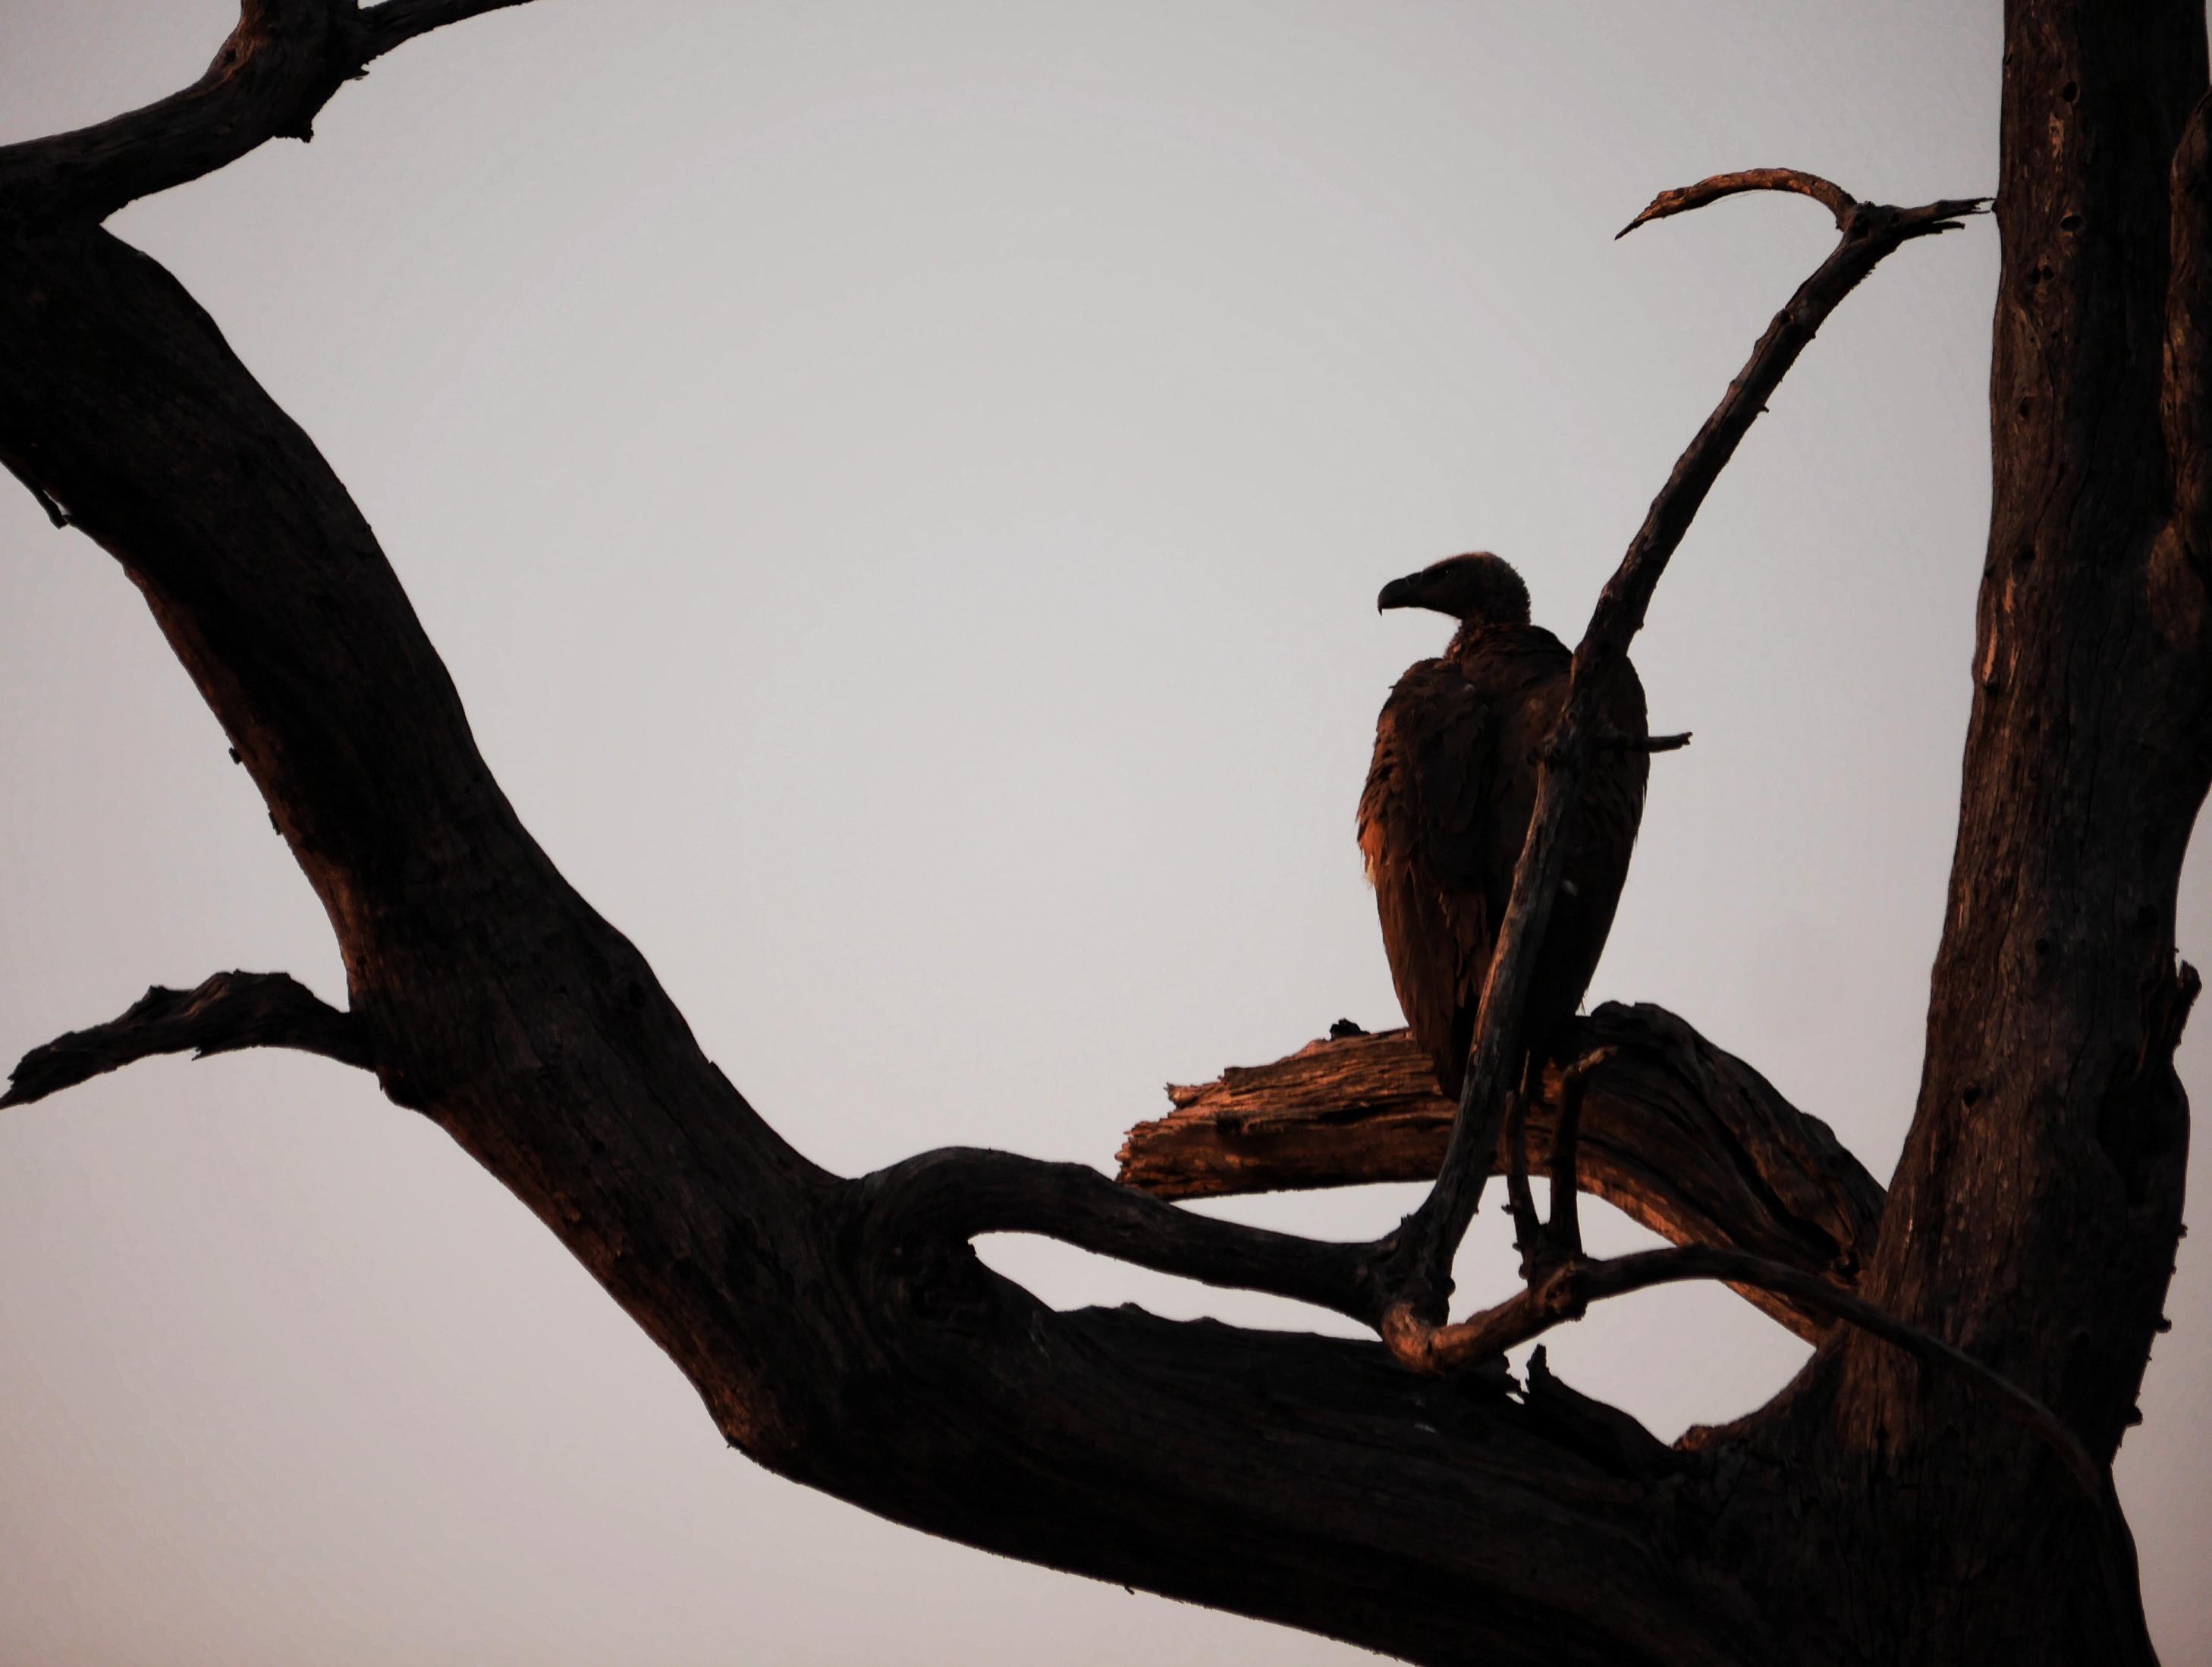 Vulture in Silhouette